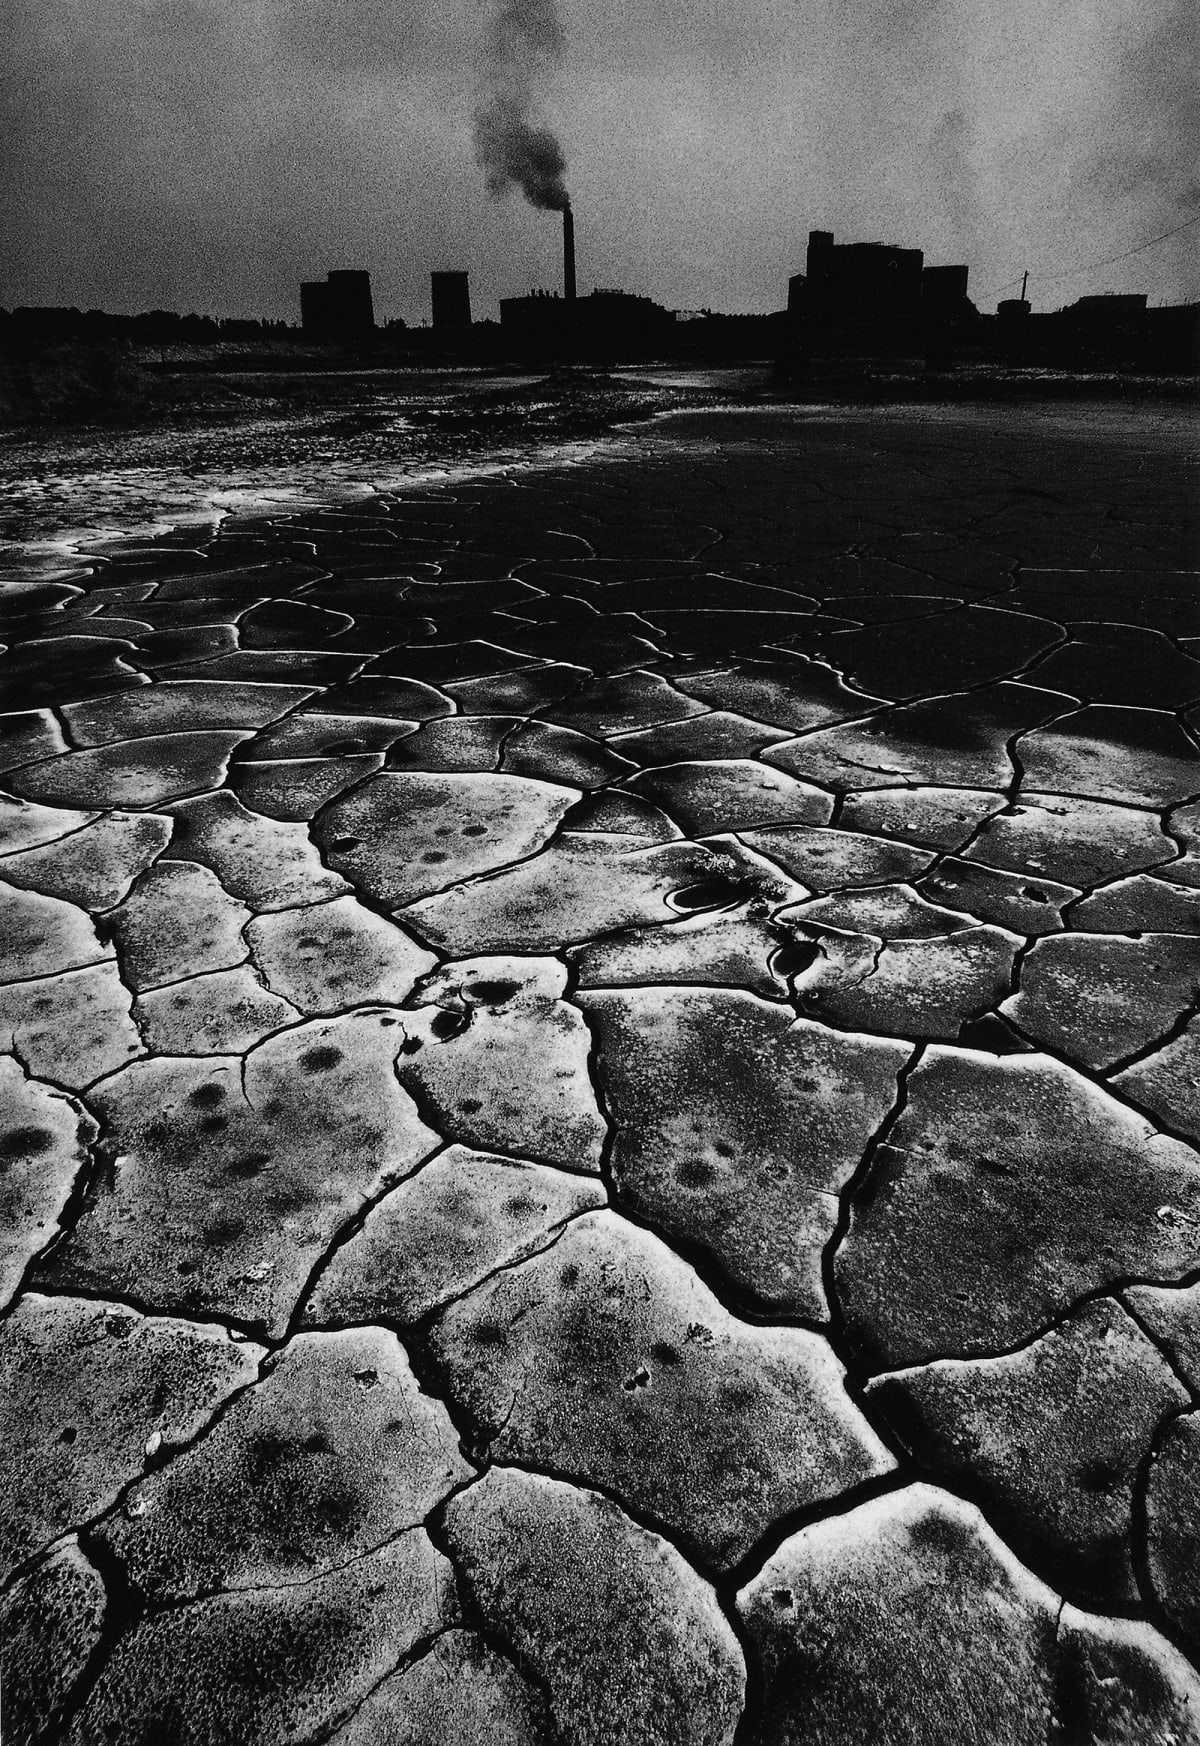 Michal Cala, The Landscape around the Marcel Mine, Radlin, 1978